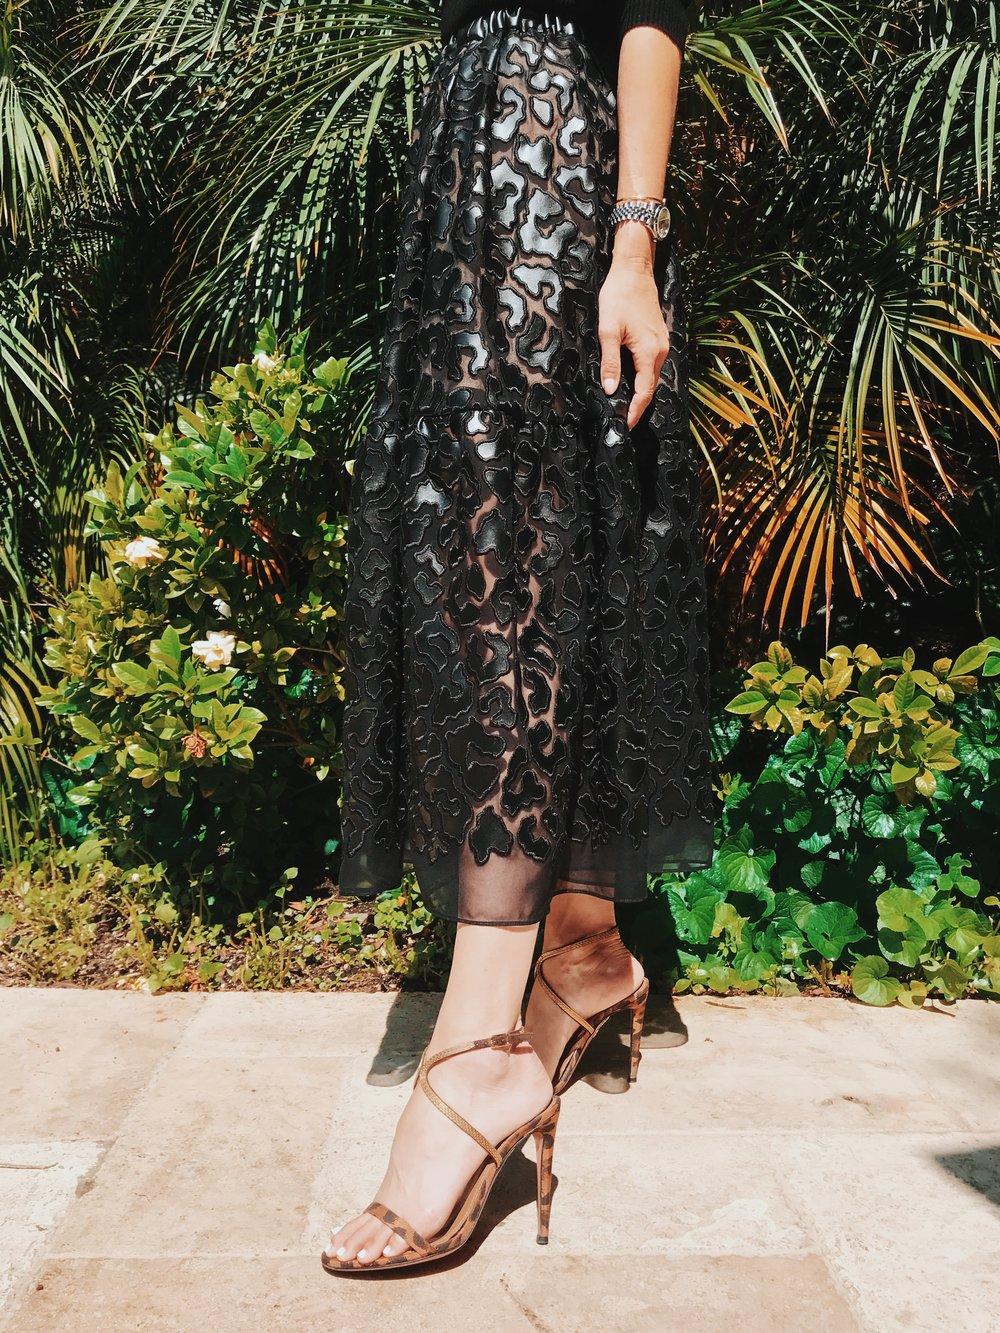 Skirt: Stella Mccartney | shoes: Aquazzura | Photo: Drew Evans